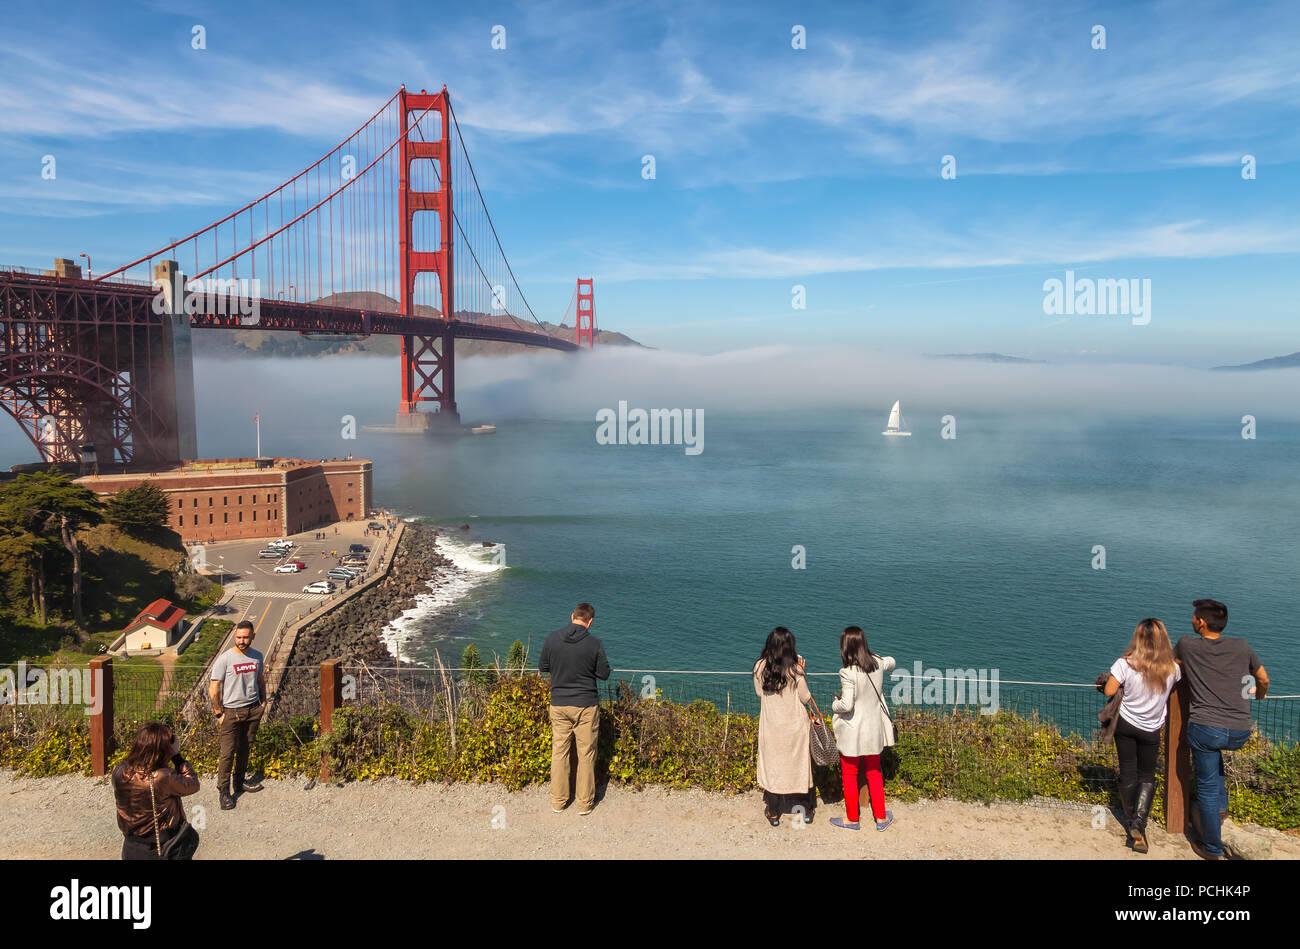 Les visiteurs au Golden Gate Bridge, San Francisco, California, United States. Photo Stock